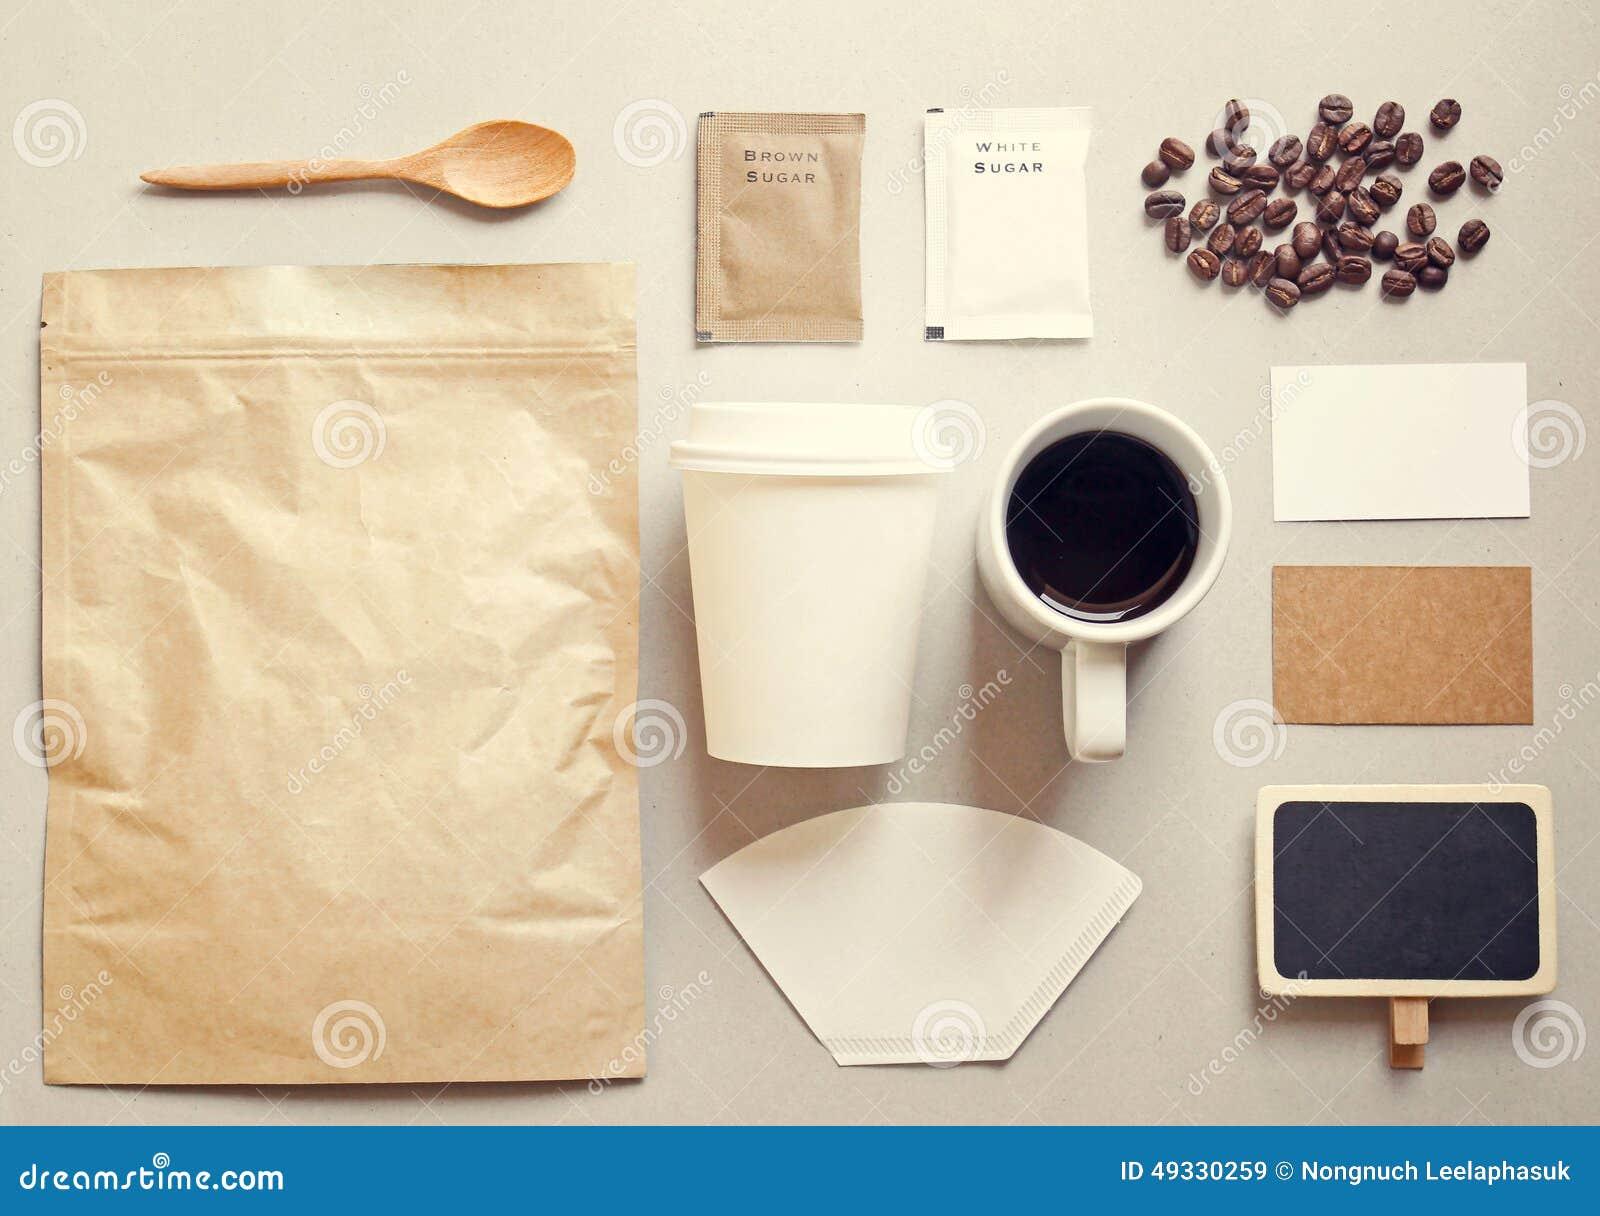 Coffee Identity Branding Mockup Set Stock Photo - Image: 49330259